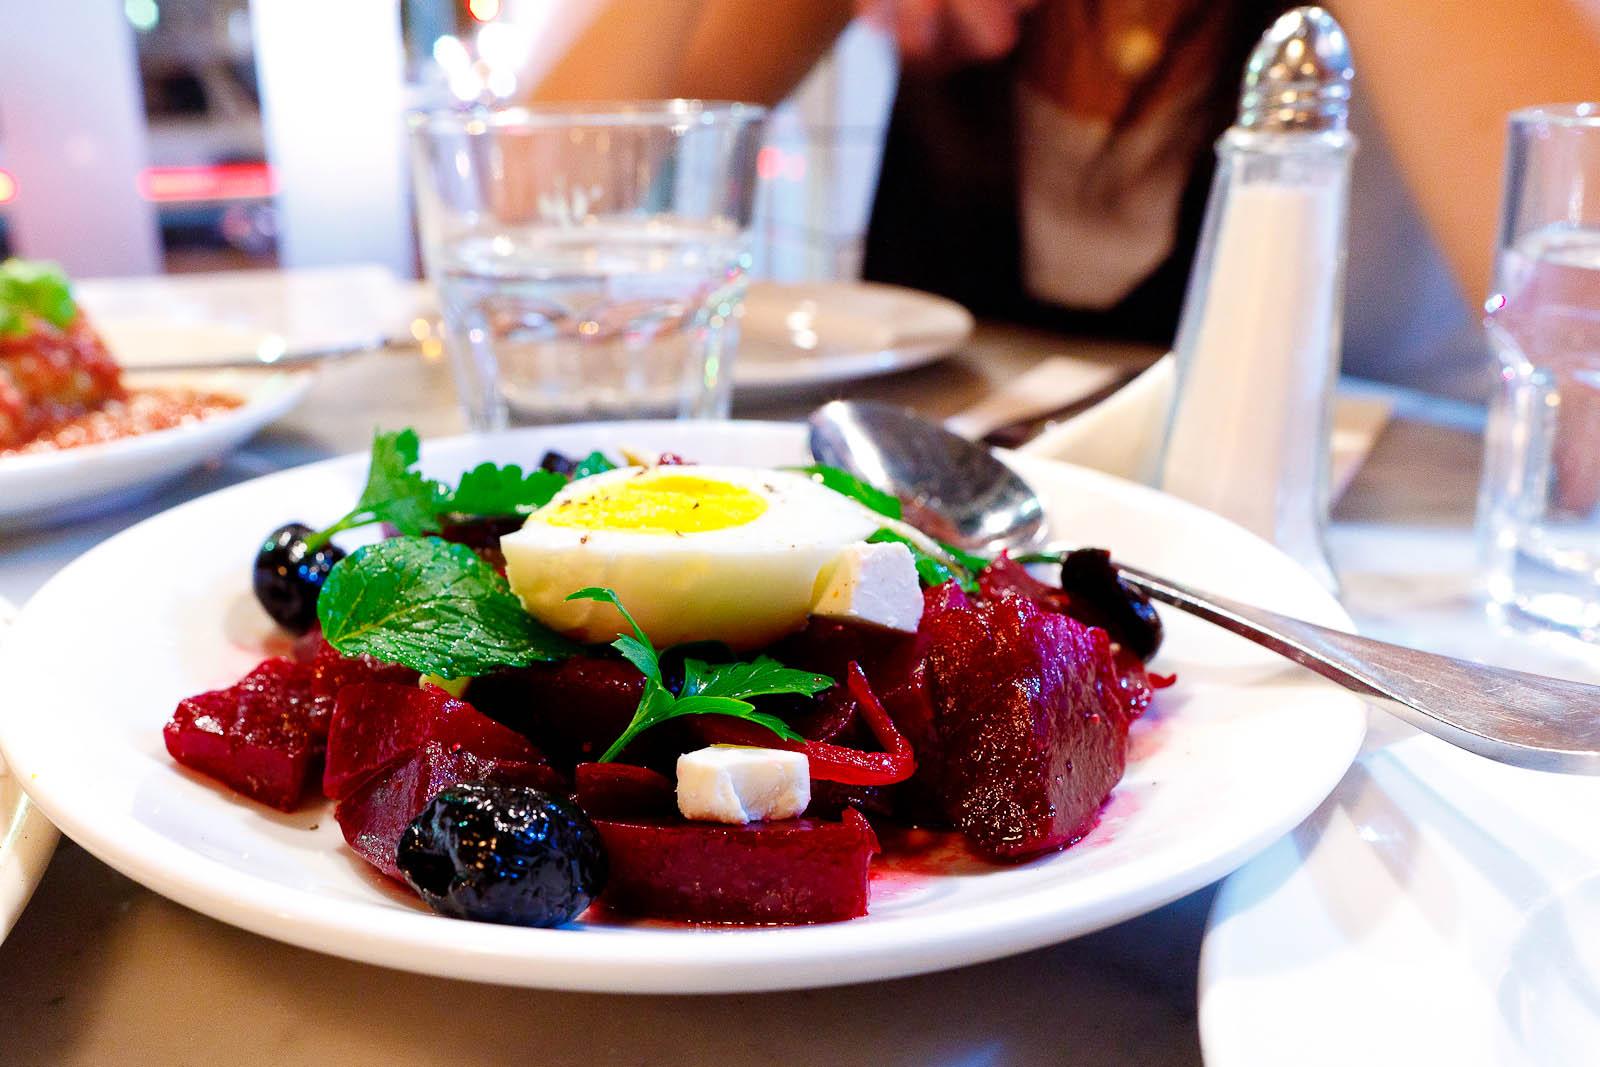 Marinated Beet Salad - soft-boiled egg, ricotta salata, white anchovy, gaeta olives, herbs ($9)